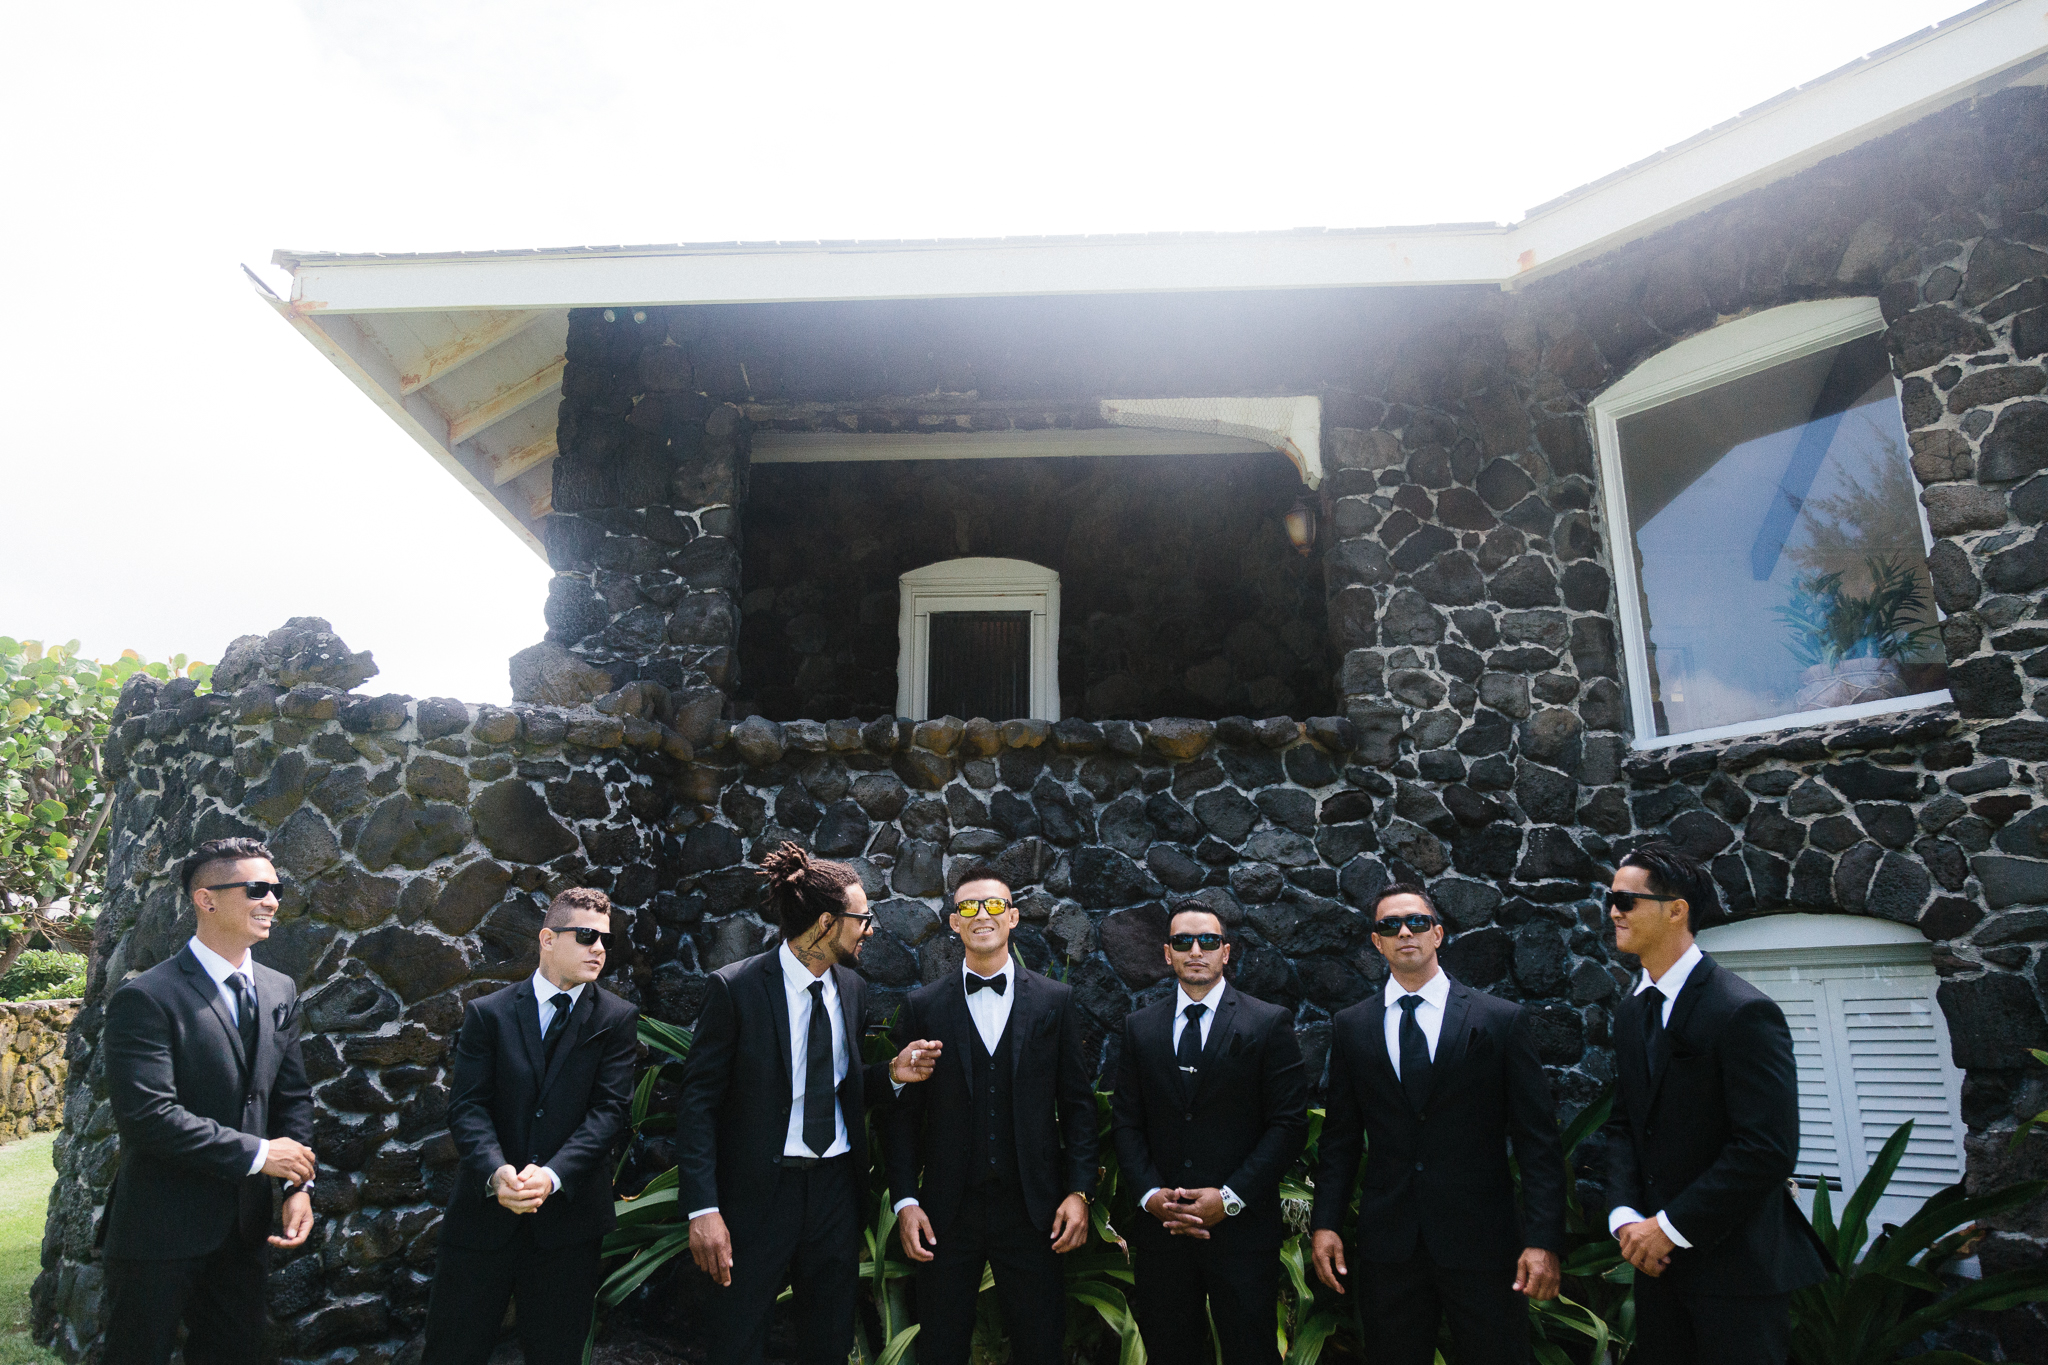 Kualoa_Ranch_Wedding_Photographer_Tone_Hawaii-2.jpg